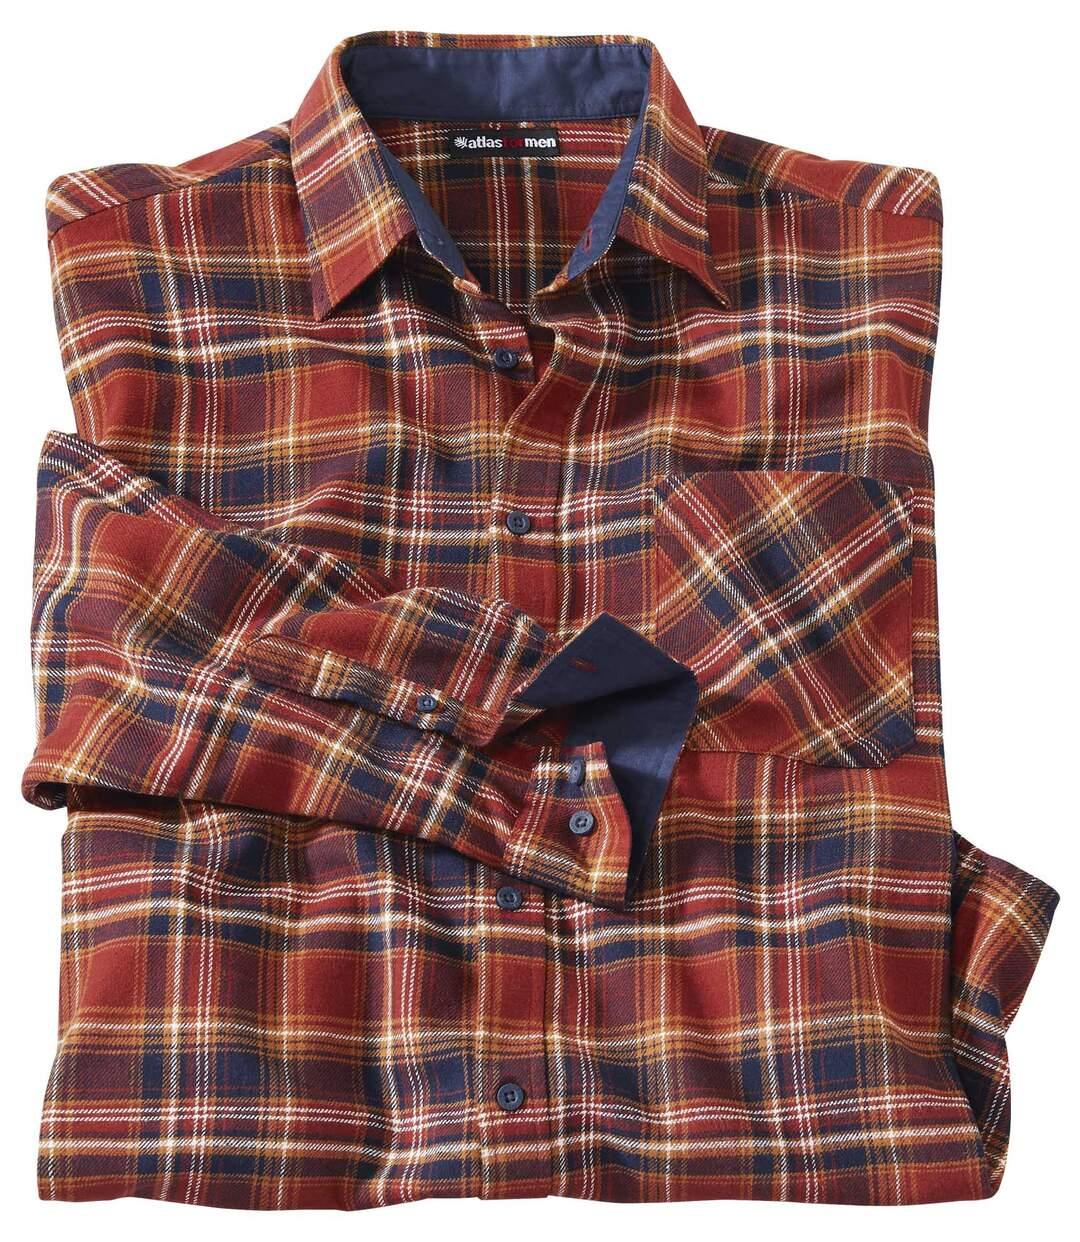 Hemden bei Atlas for Men mit bis zu 70% Rabatt